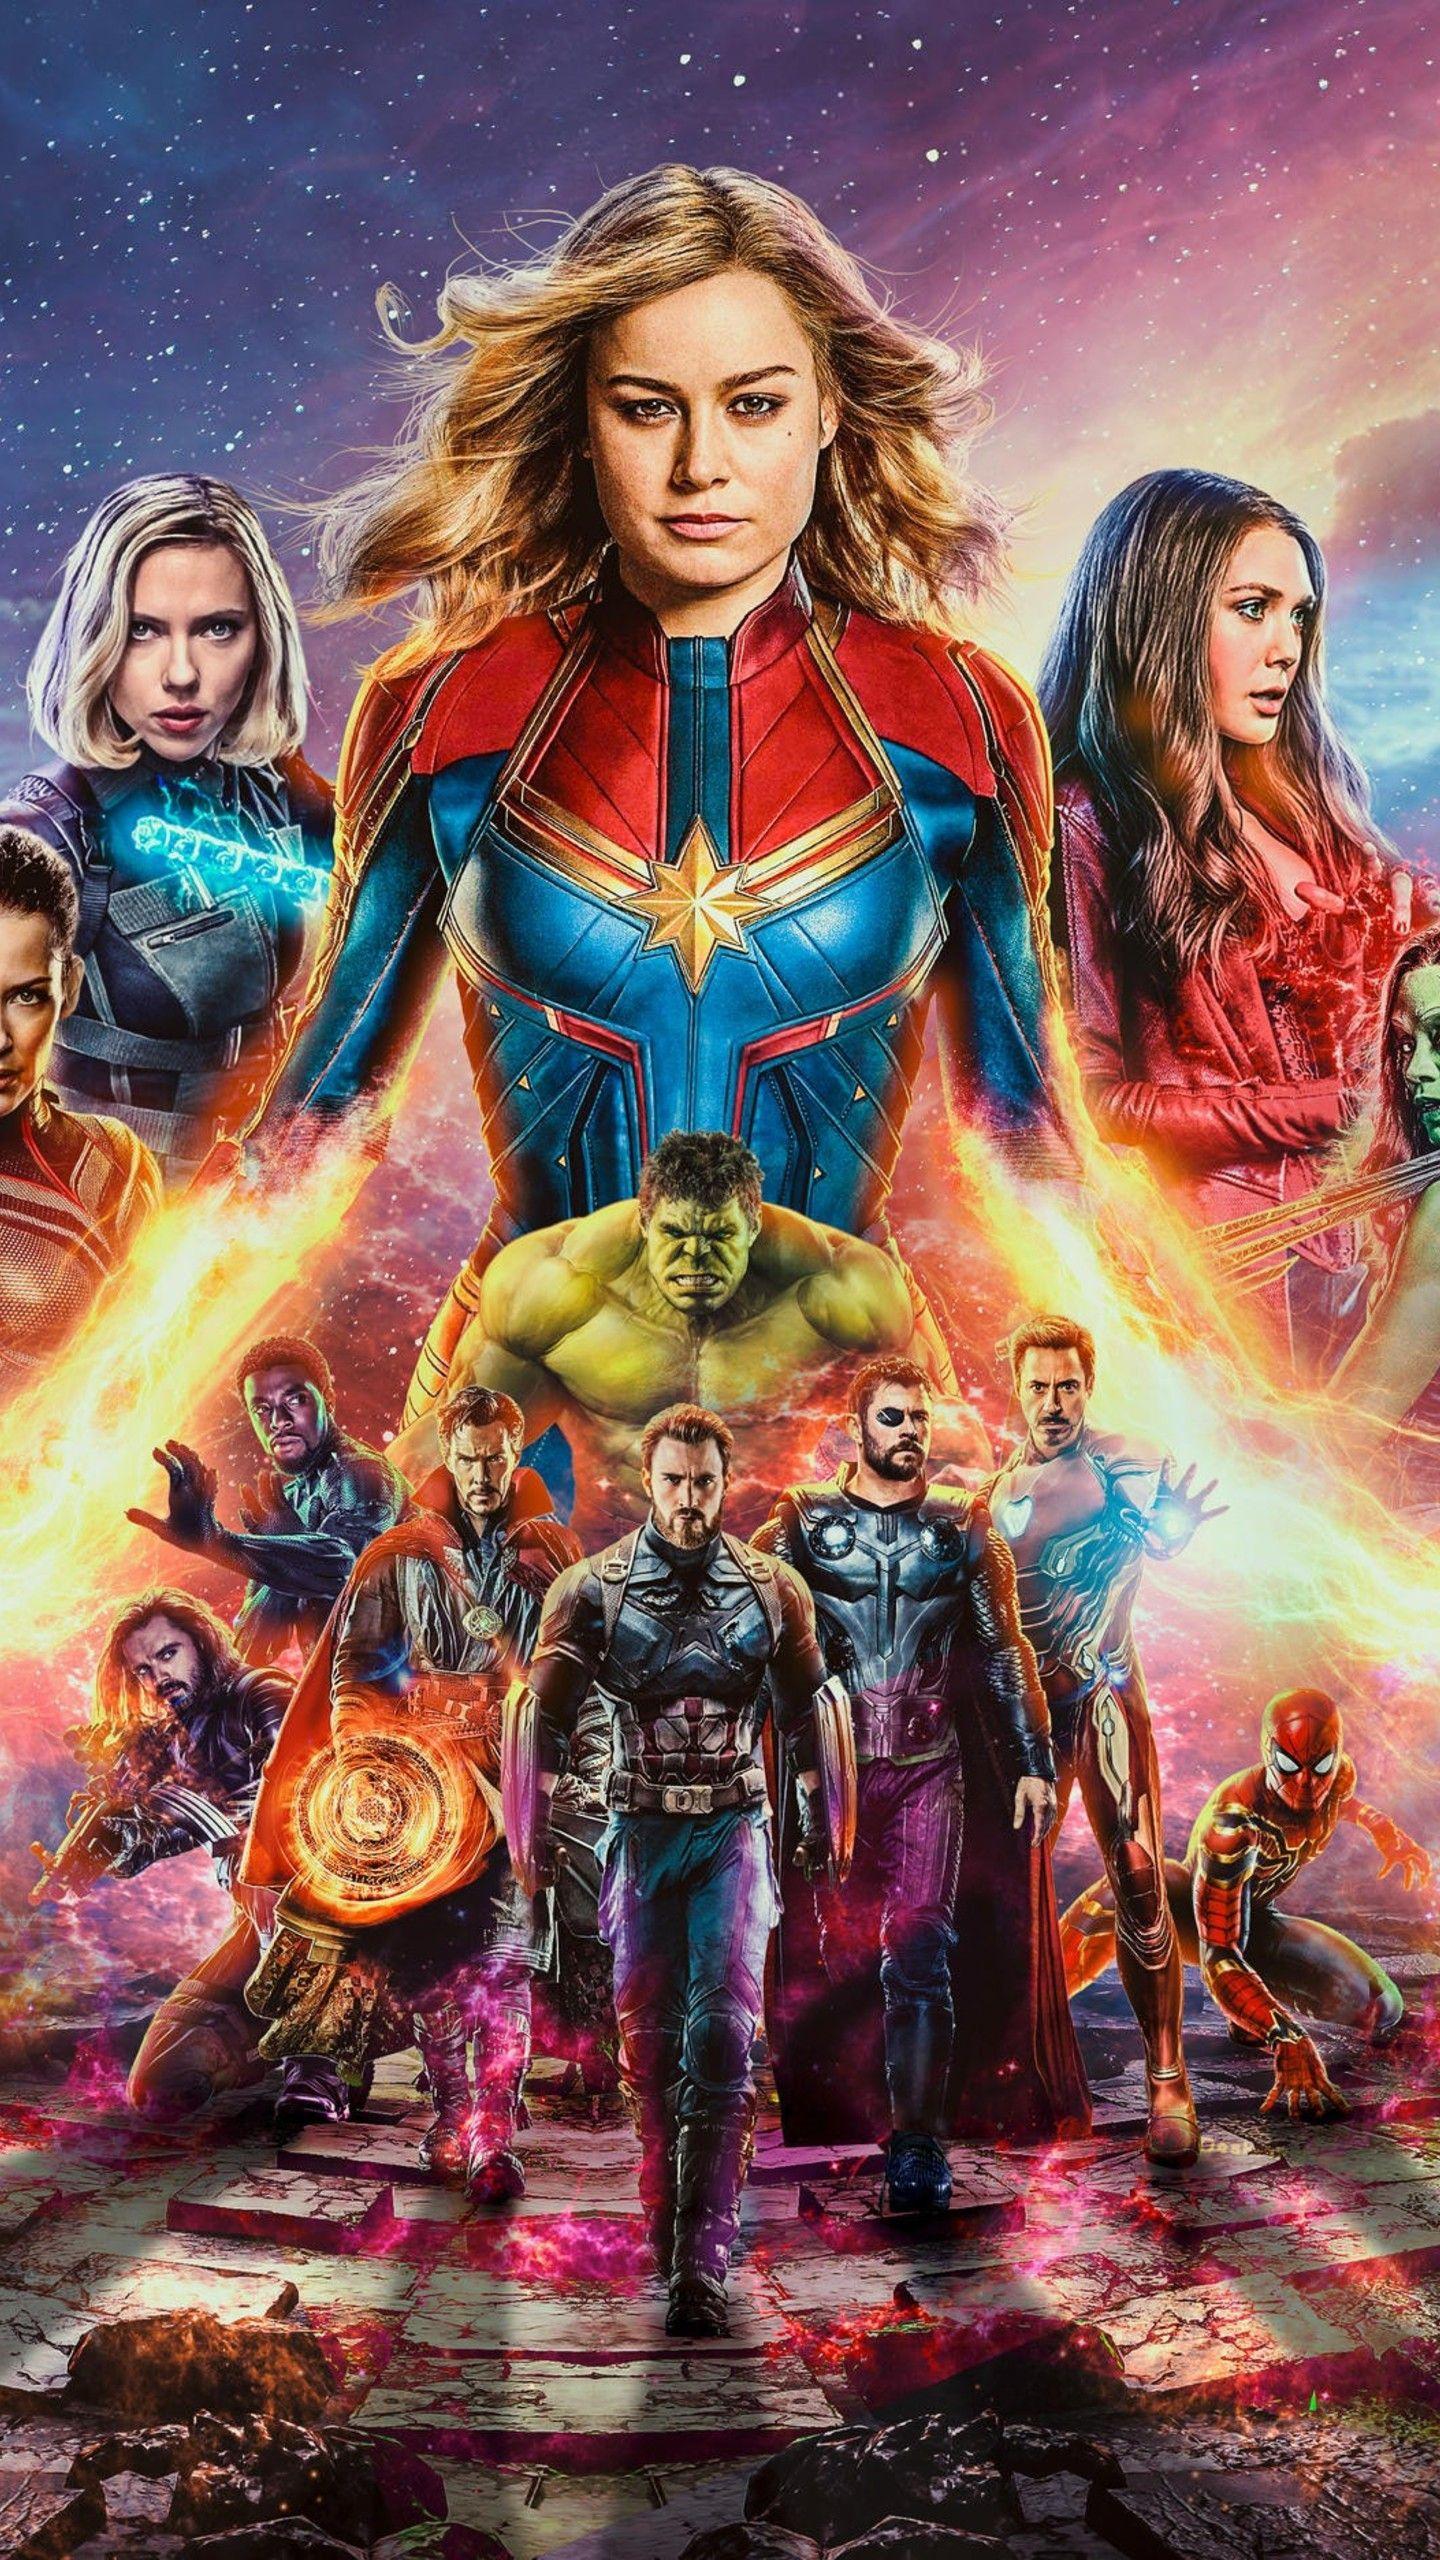 Download Hd Wallpapers Follow Wallpaper Hook To Download Avengers Avengers Endgame Marvel Marvel Cinematic Universe Movies Marvel Thor Marvel Wallpaper